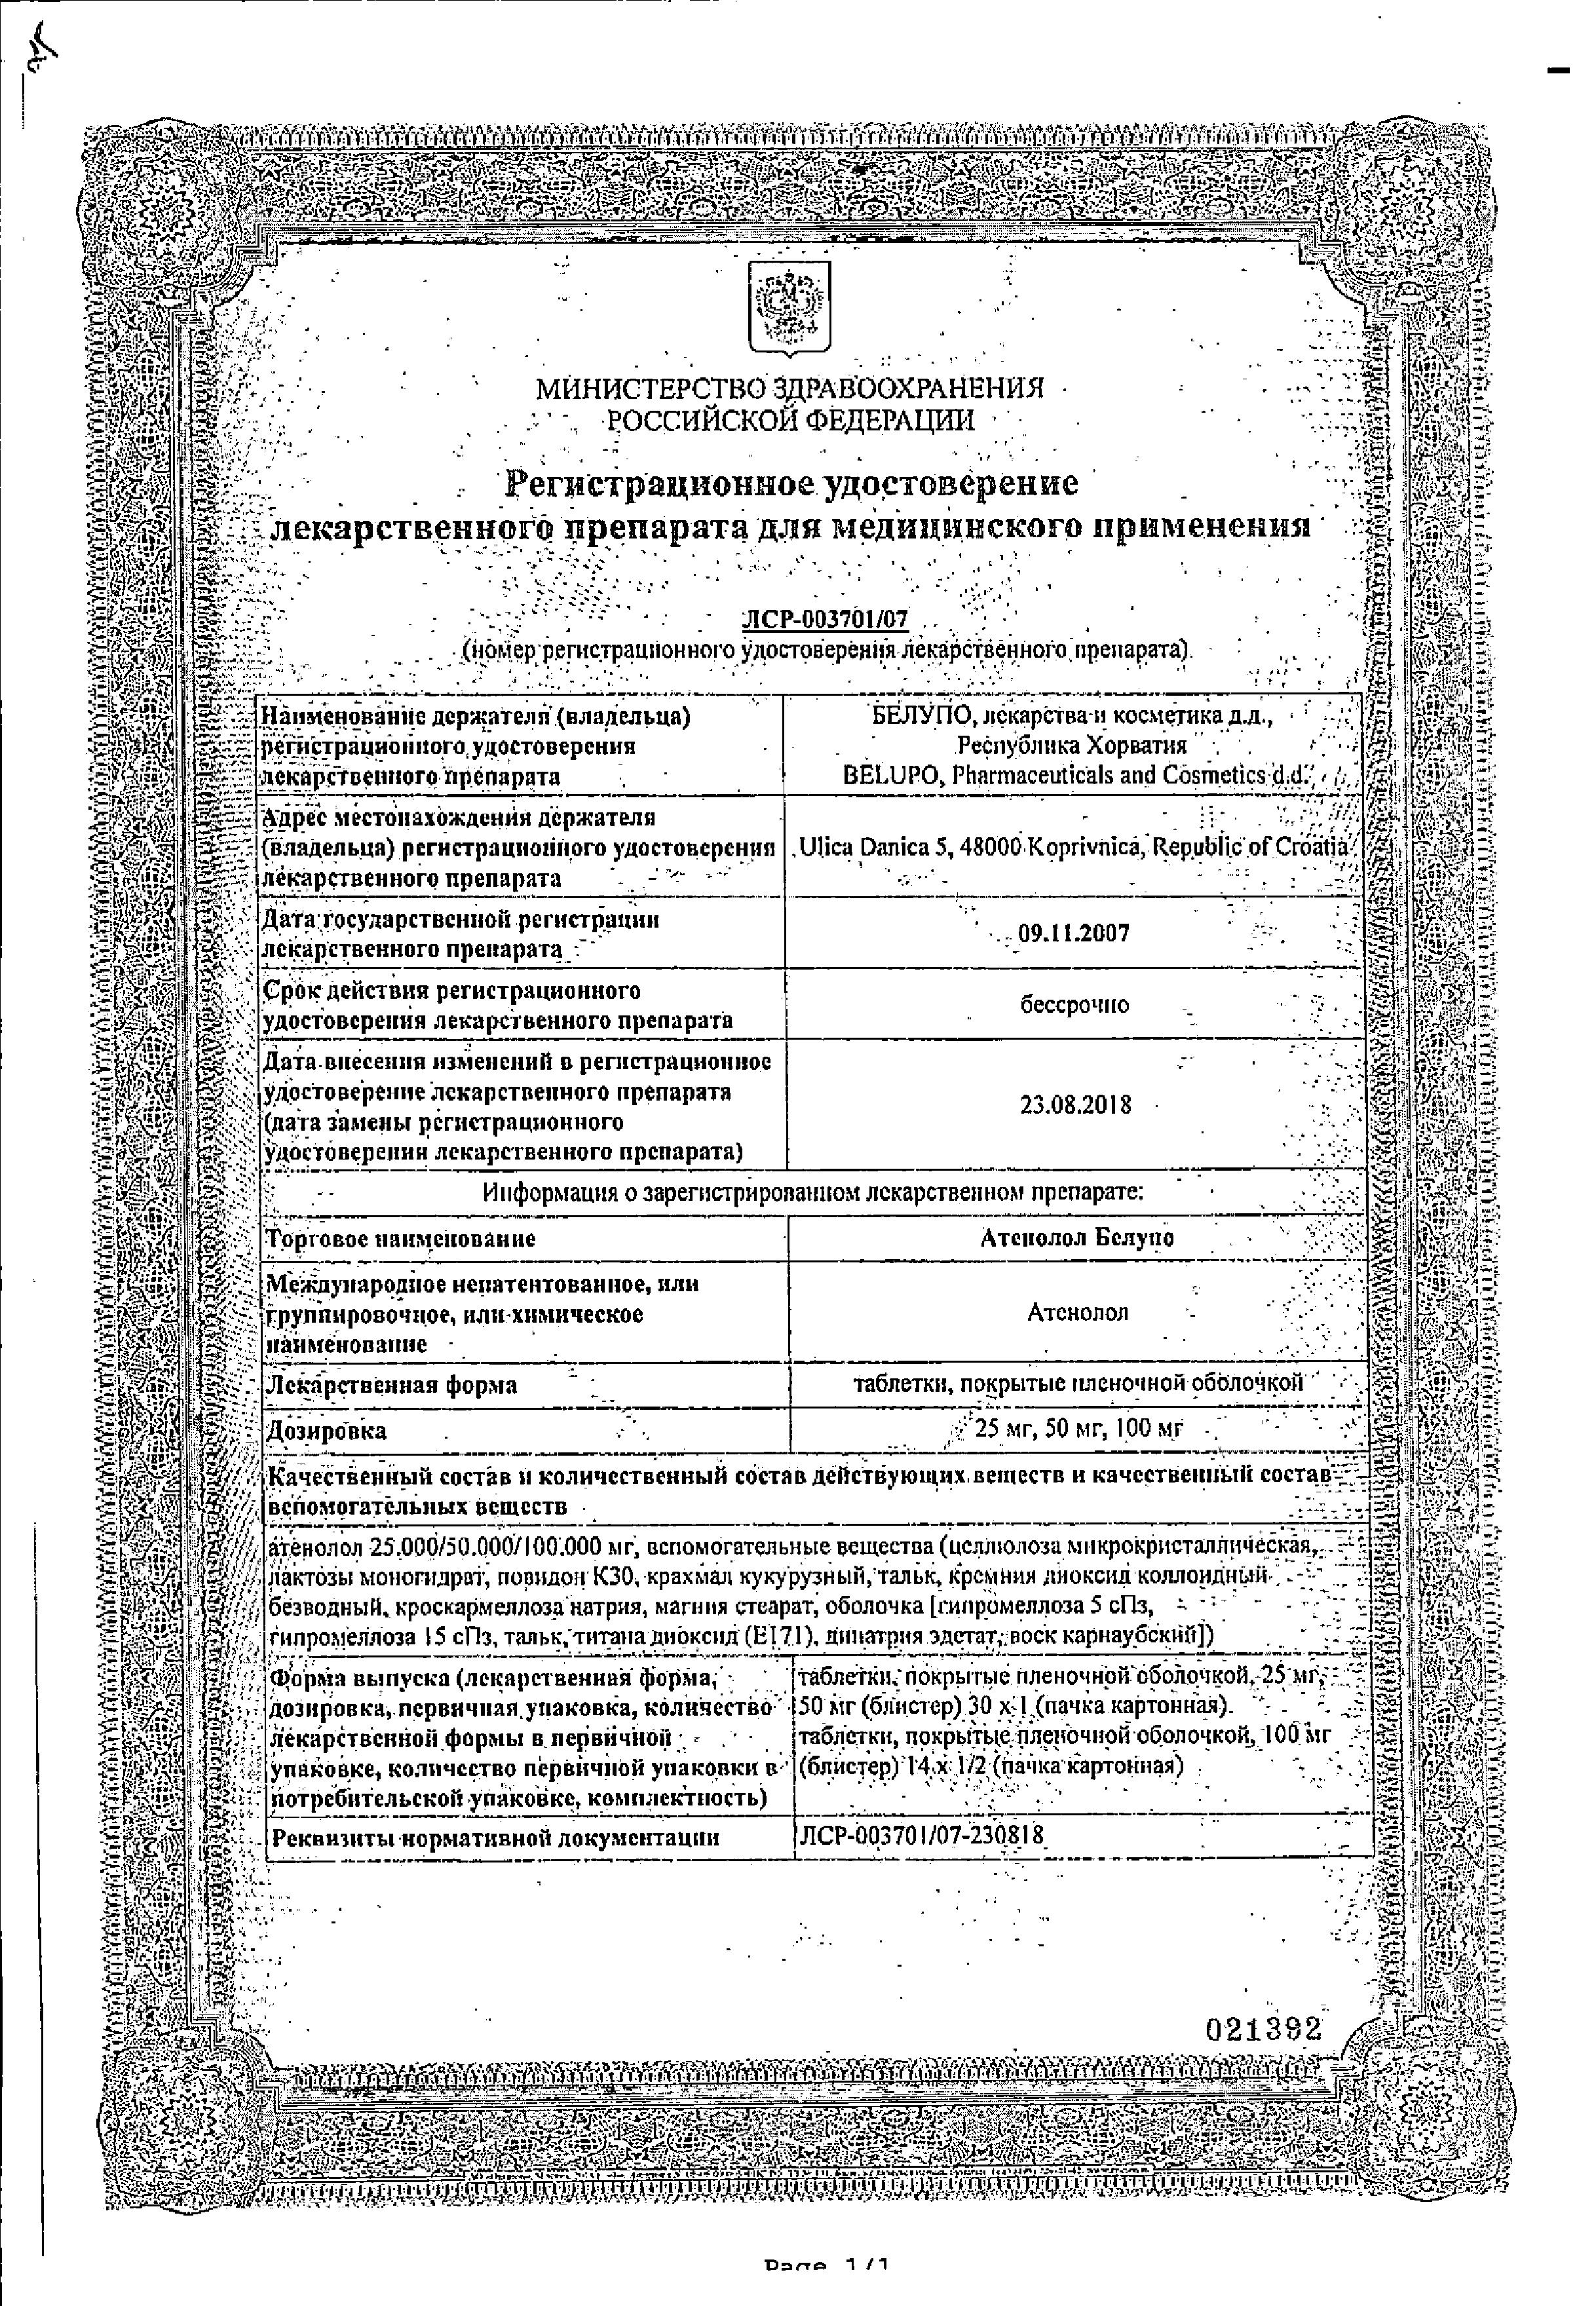 Атенолол Белупо сертификат